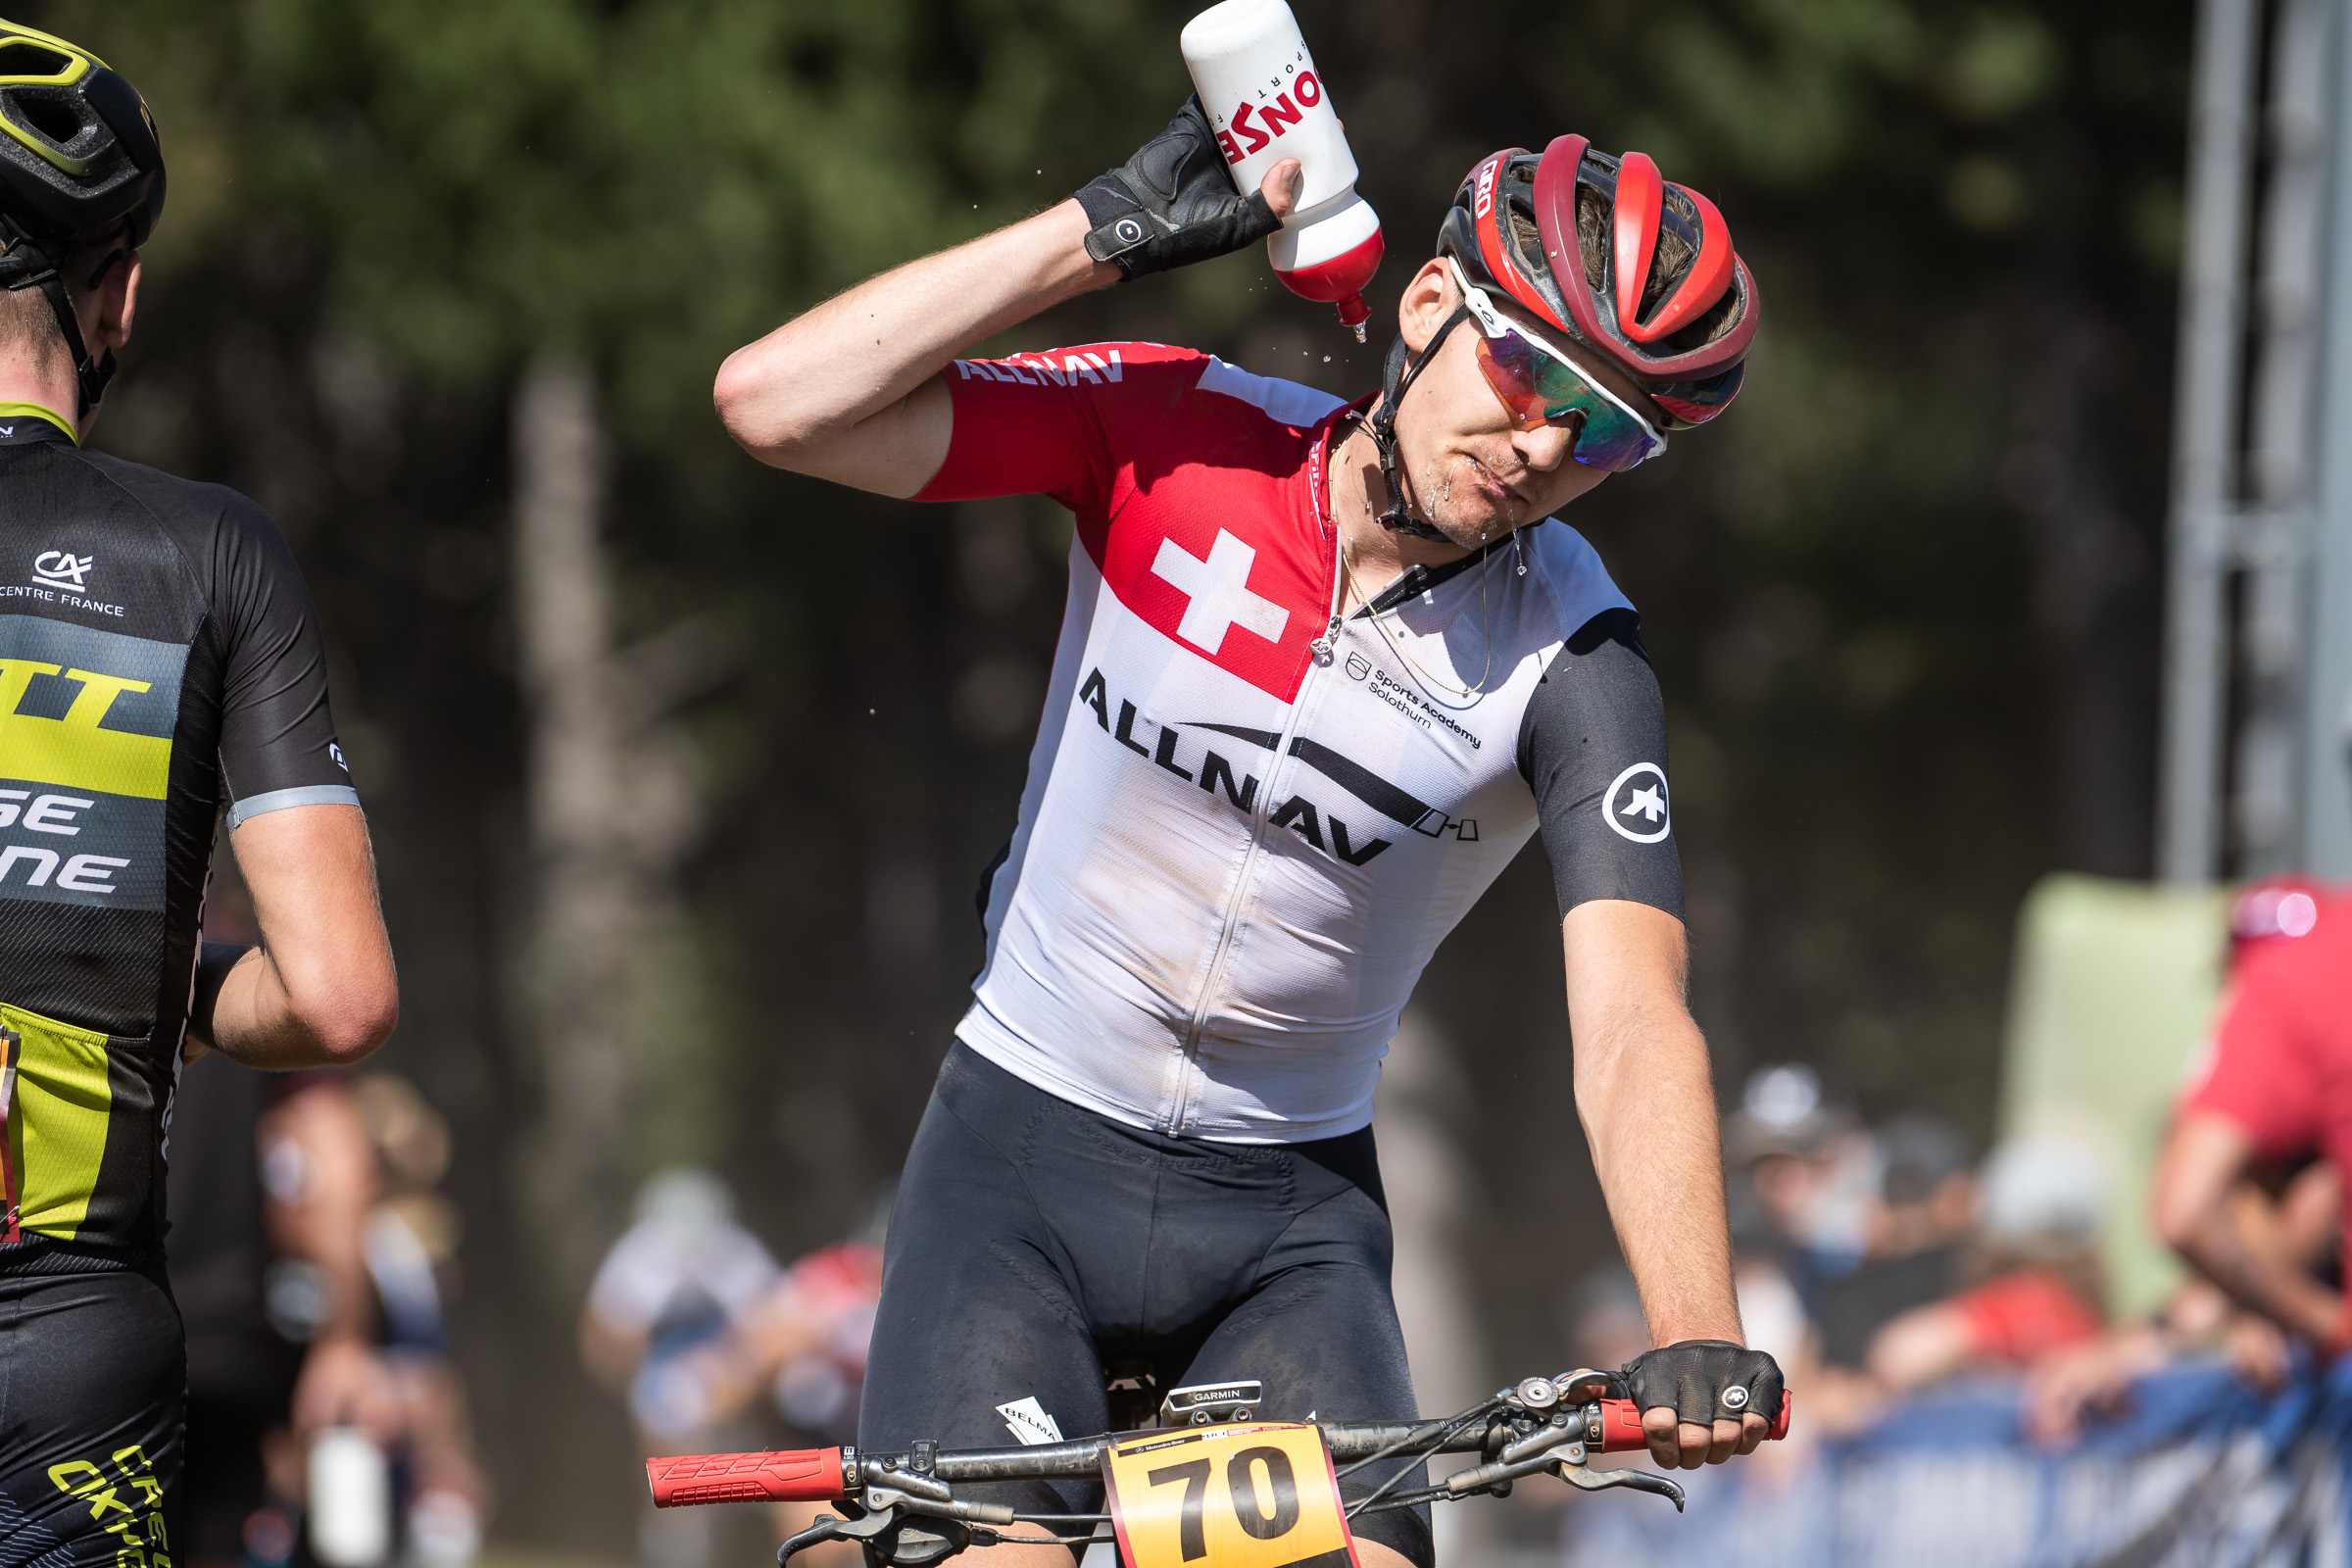 70, Burki, Nick, Bike Team Solothurn, Biketeam Solothurn, SUI